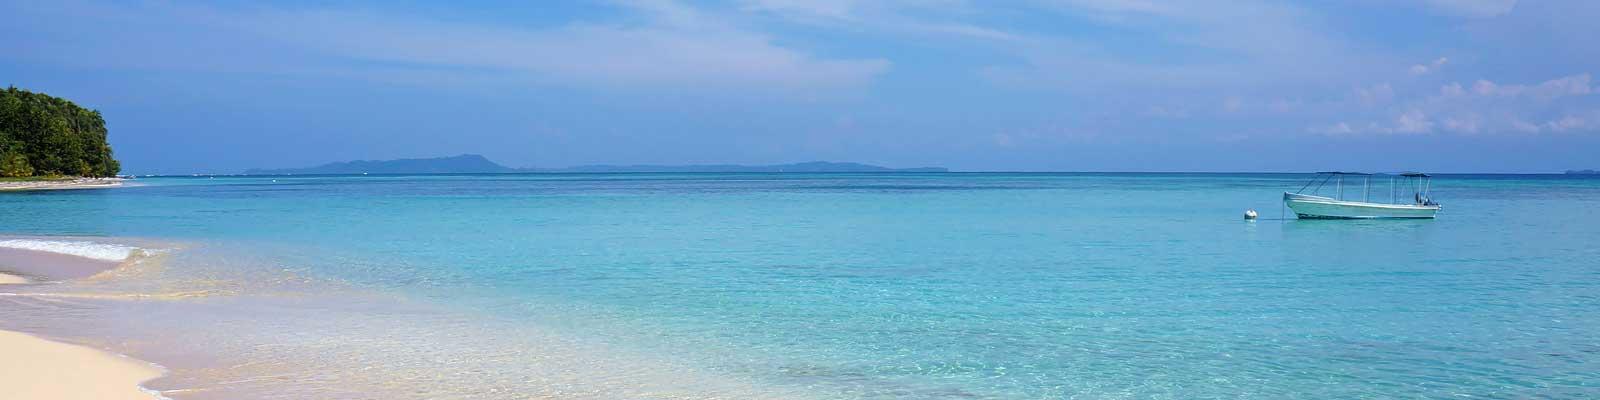 Panama Tranquilo Mar Azul Escritorios, Abra seu comercio. Alugar Casas, Apartamentos.